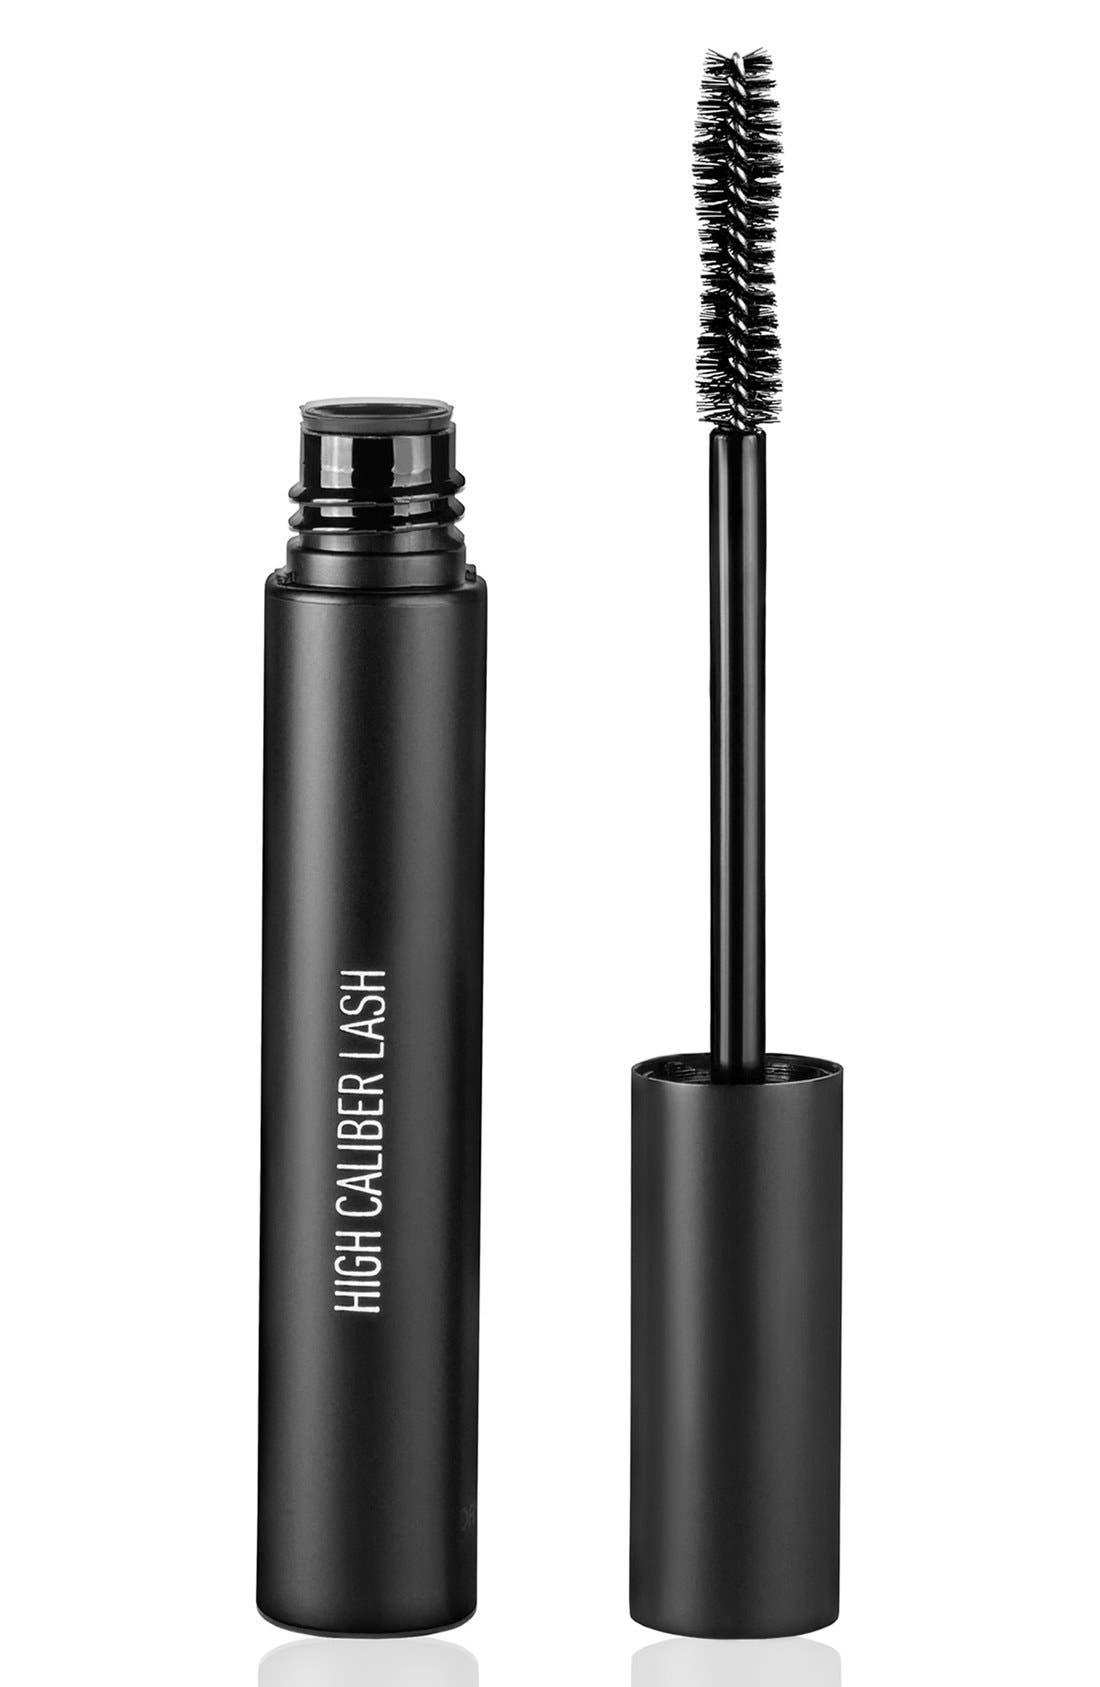 Sigma Beauty 'High Caliber Lash' Mascara